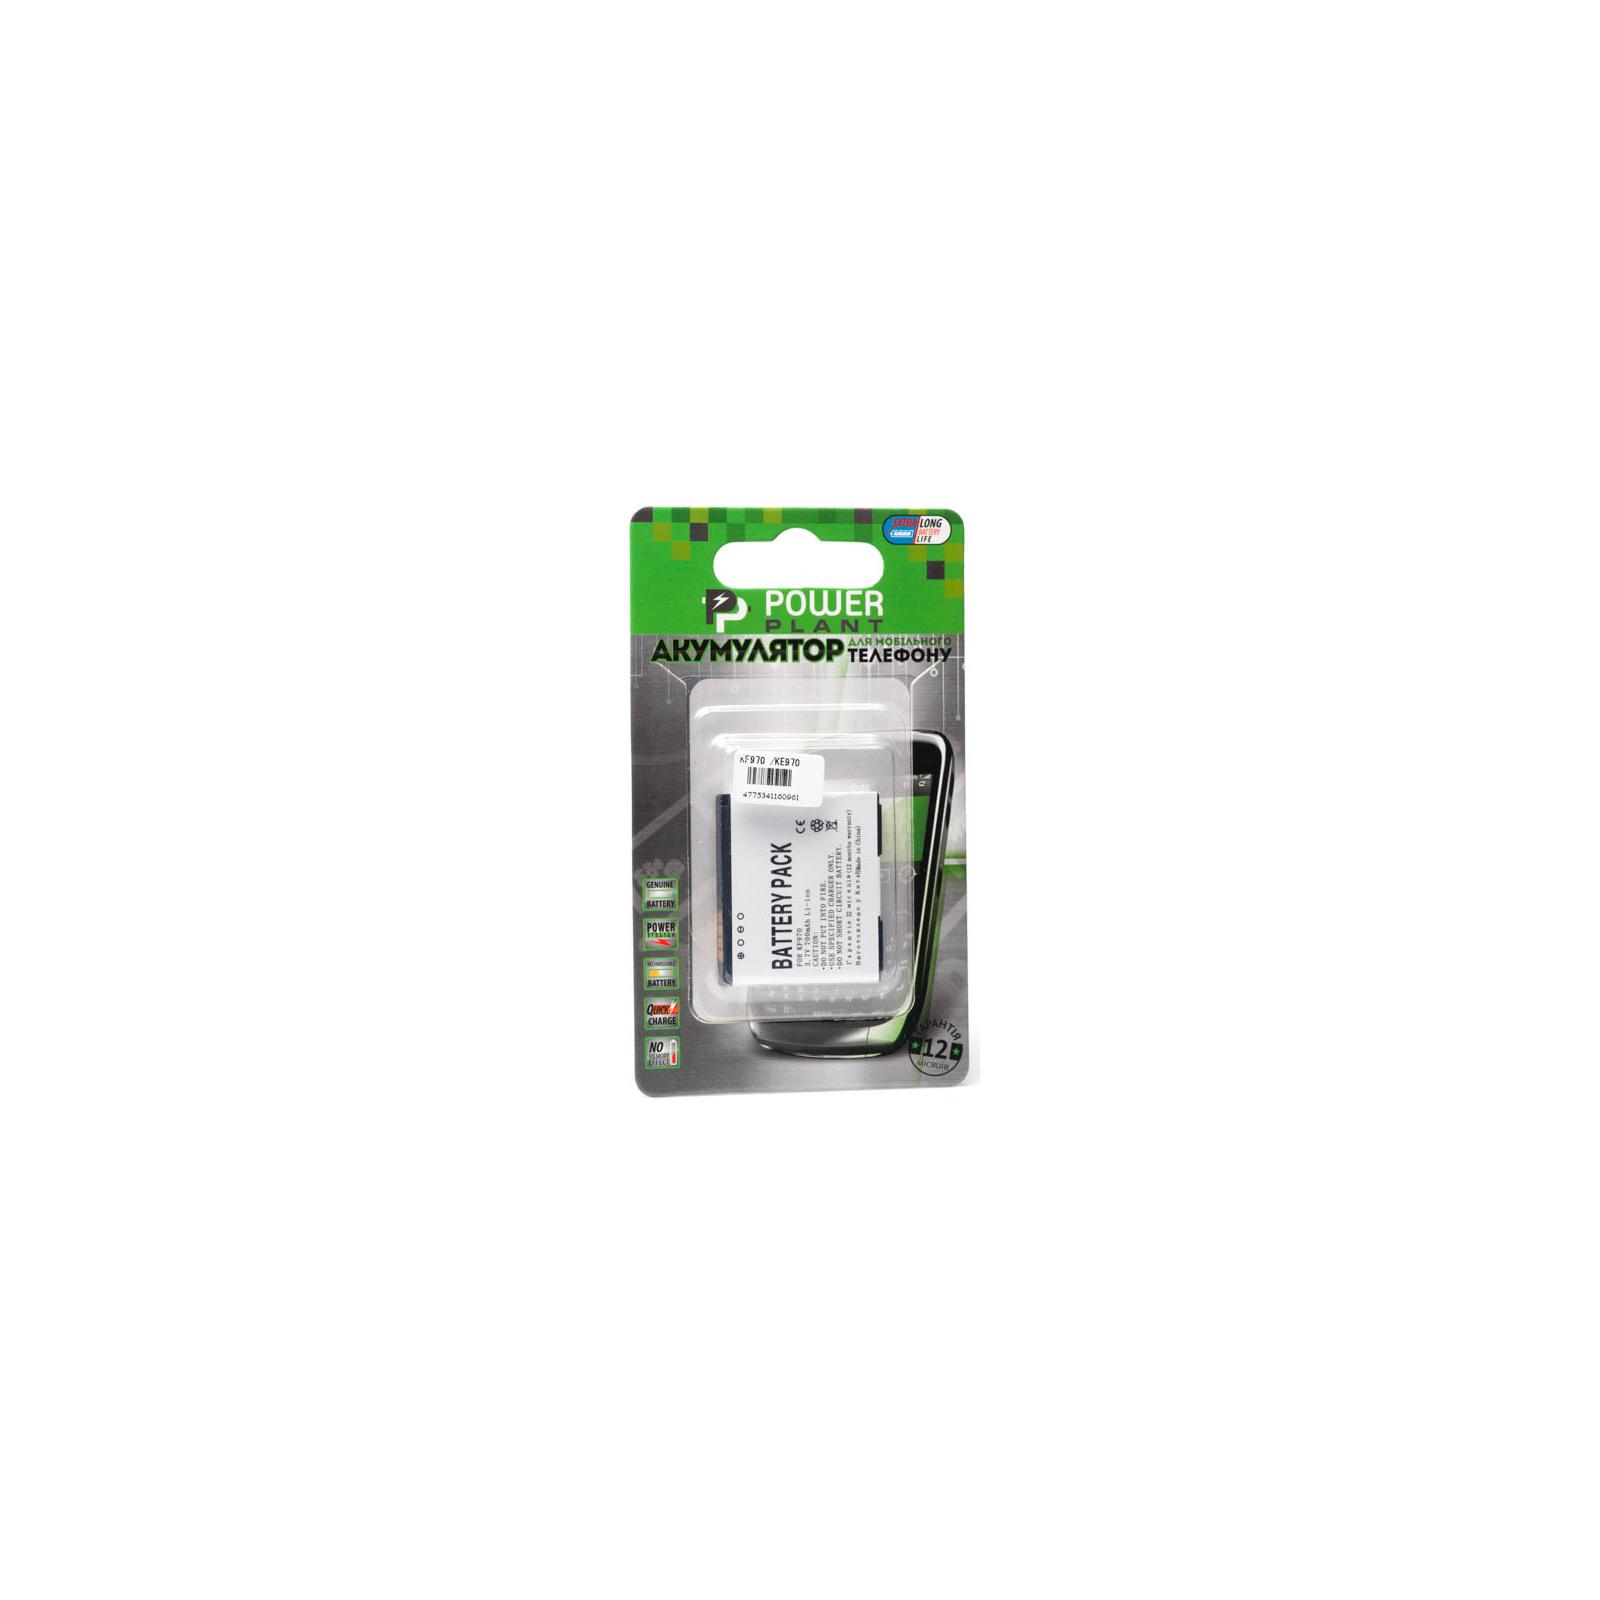 Аккумуляторная батарея PowerPlant LG IP-470A (GM210, KF970, KE970, KF600, KF750, KF600) (DV00DV6096)